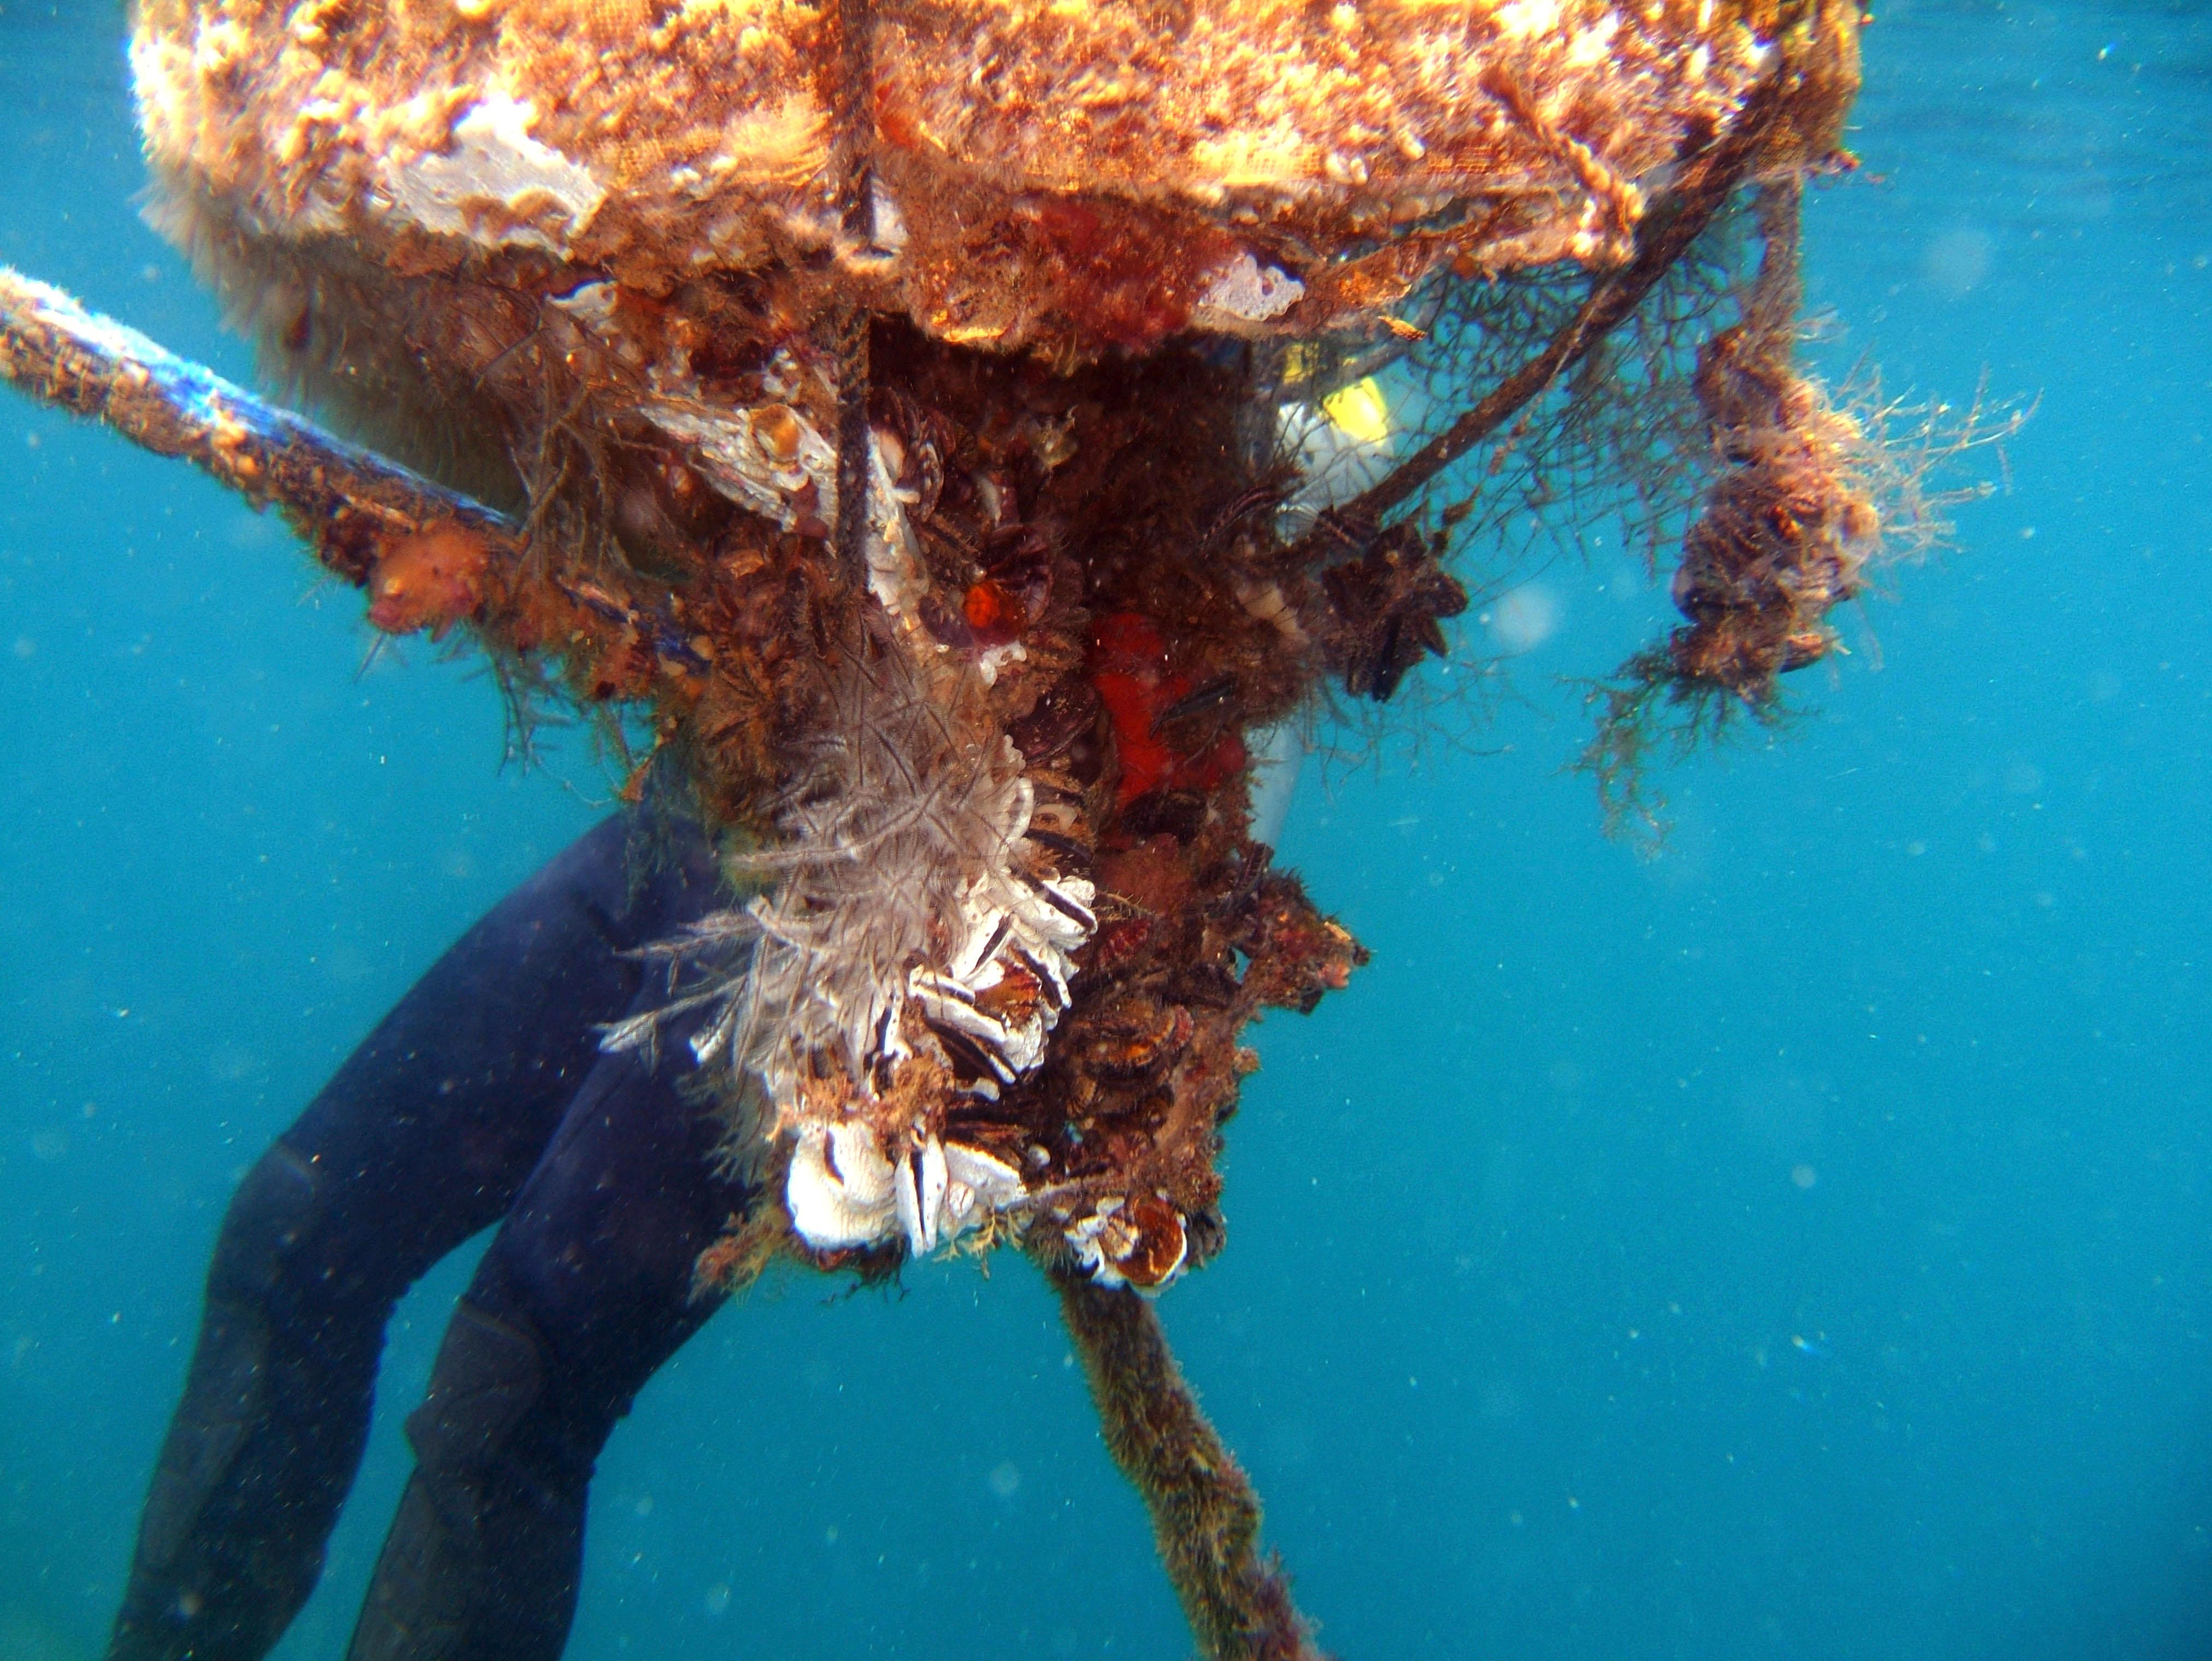 Coron dive site 2 Wreck dive IJN Taiei Maru July 2005 23